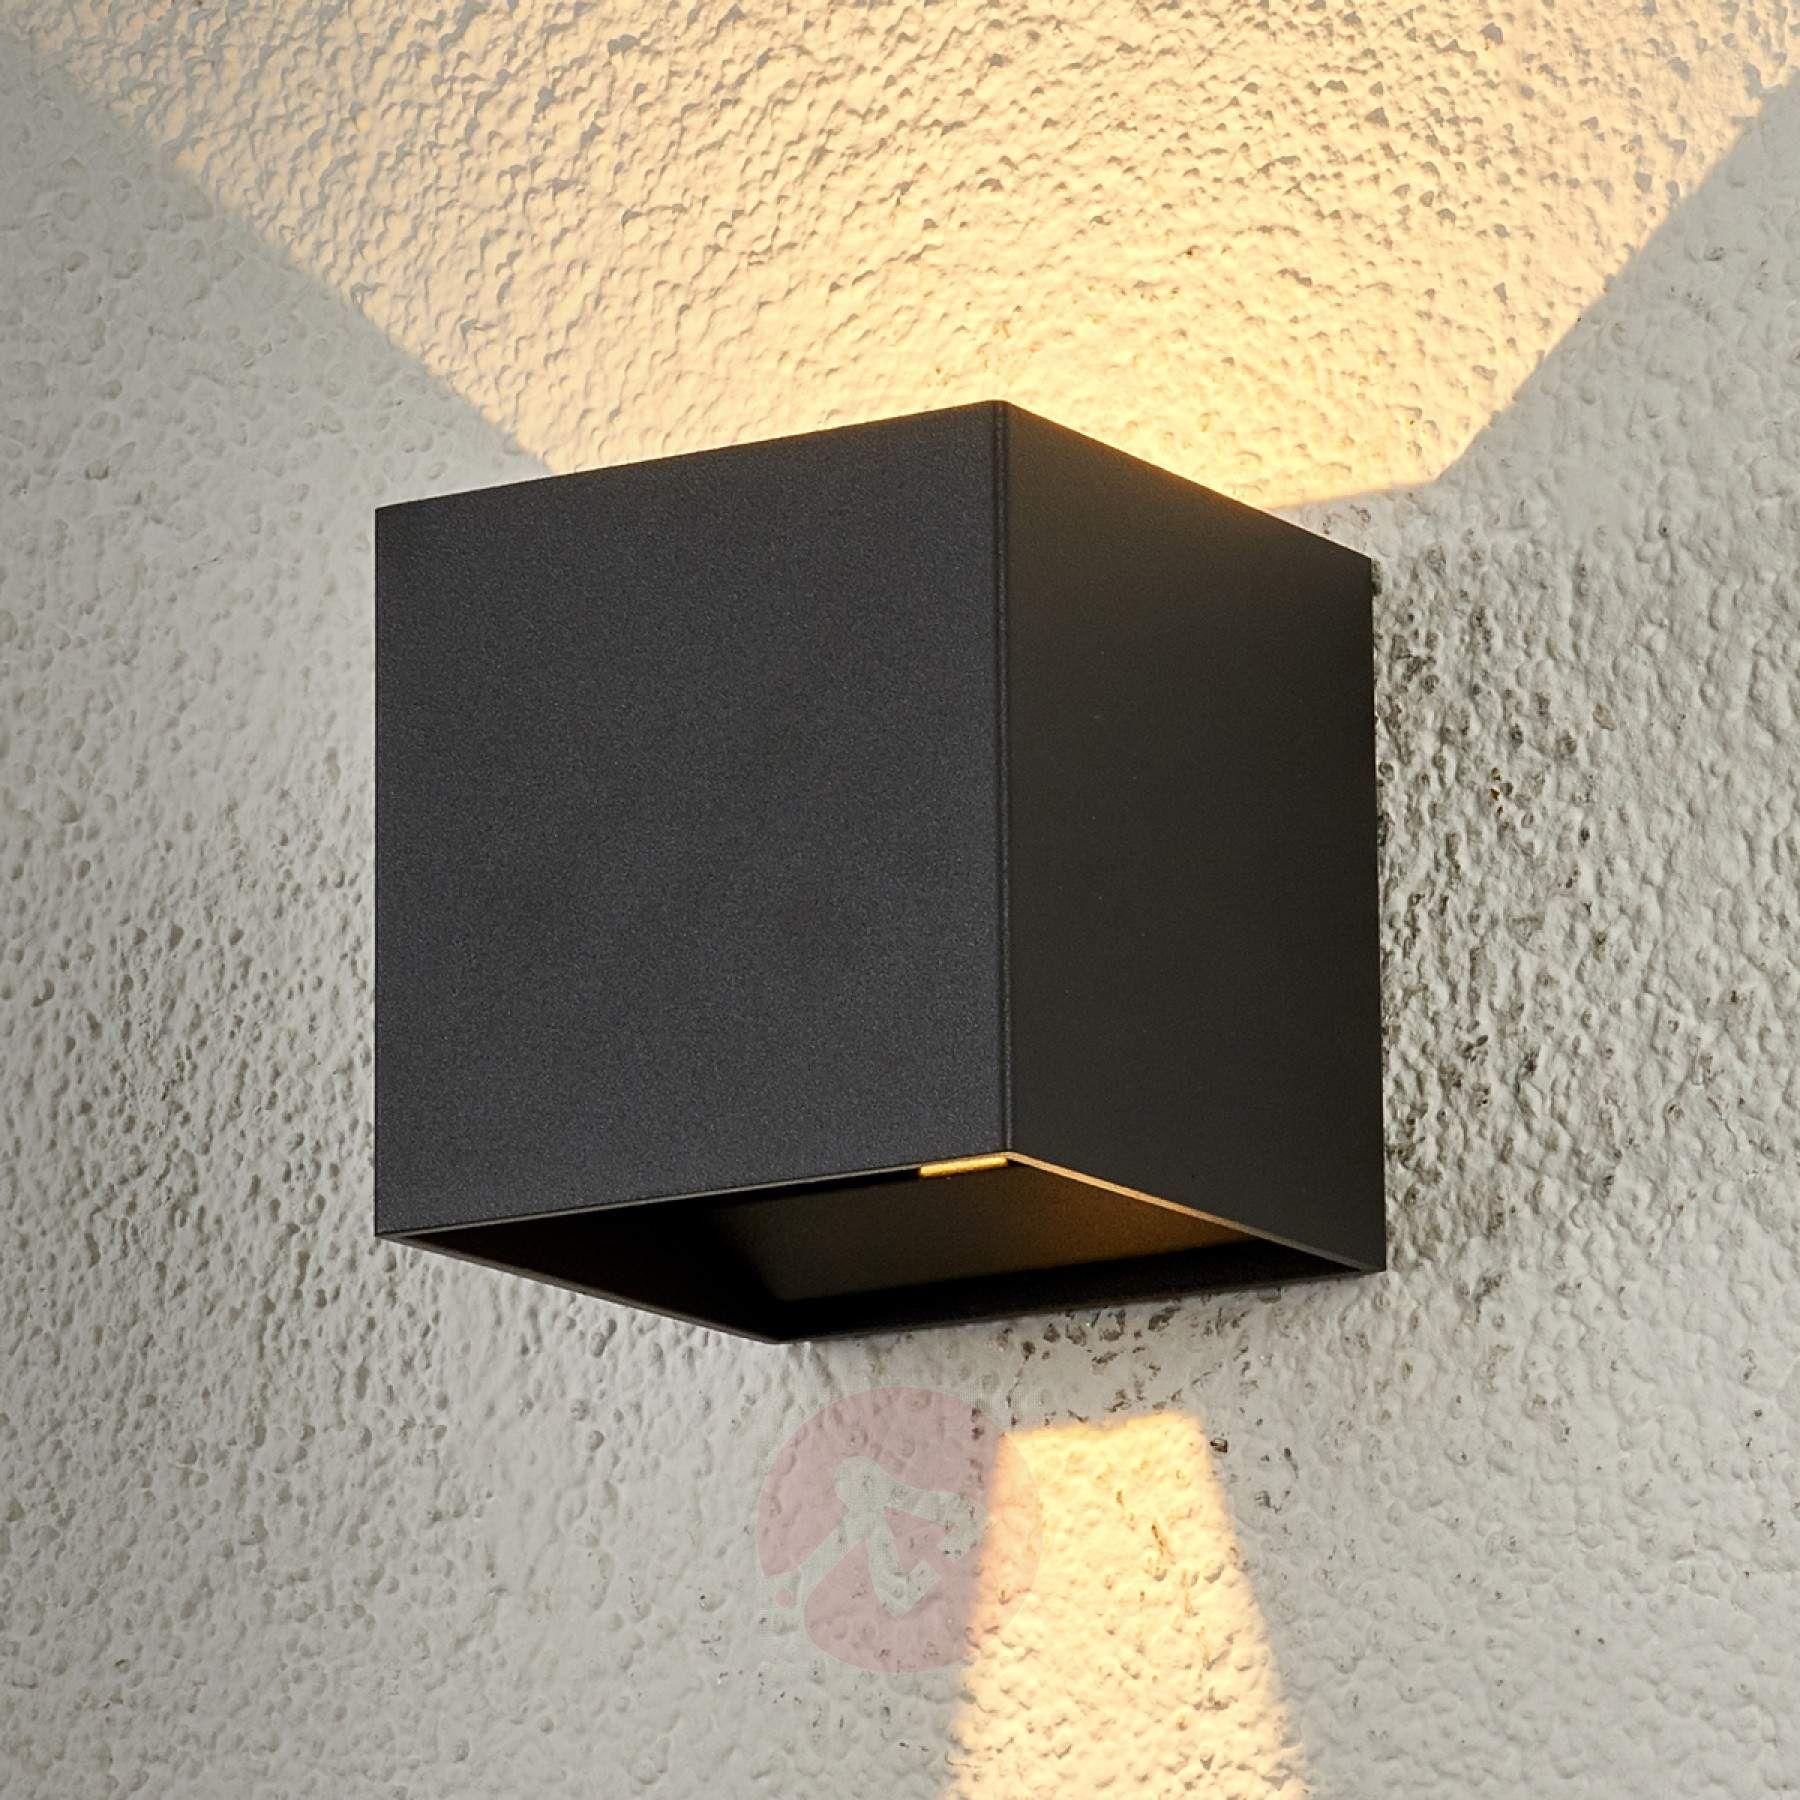 Wurfelformige Led Aussenwandlampe Ella 9955013 02 Aussenwandbeleuchtung Aussenwandleuchte Aussenwand